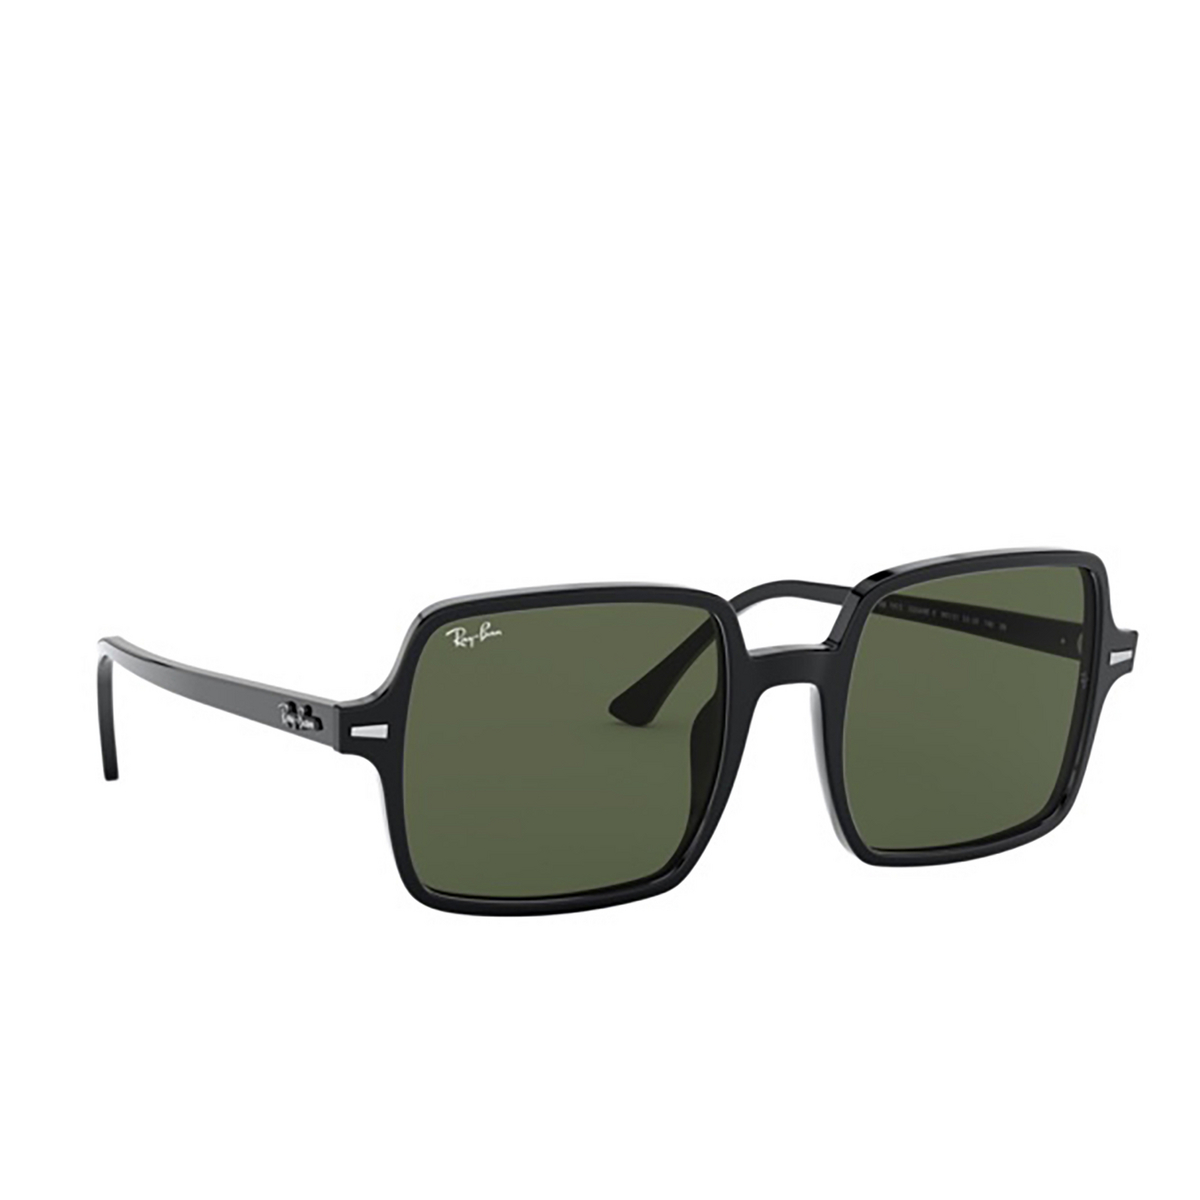 Ray-Ban® Square Sunglasses: Square Ii RB1973 color Black 901/31 - three-quarters view.